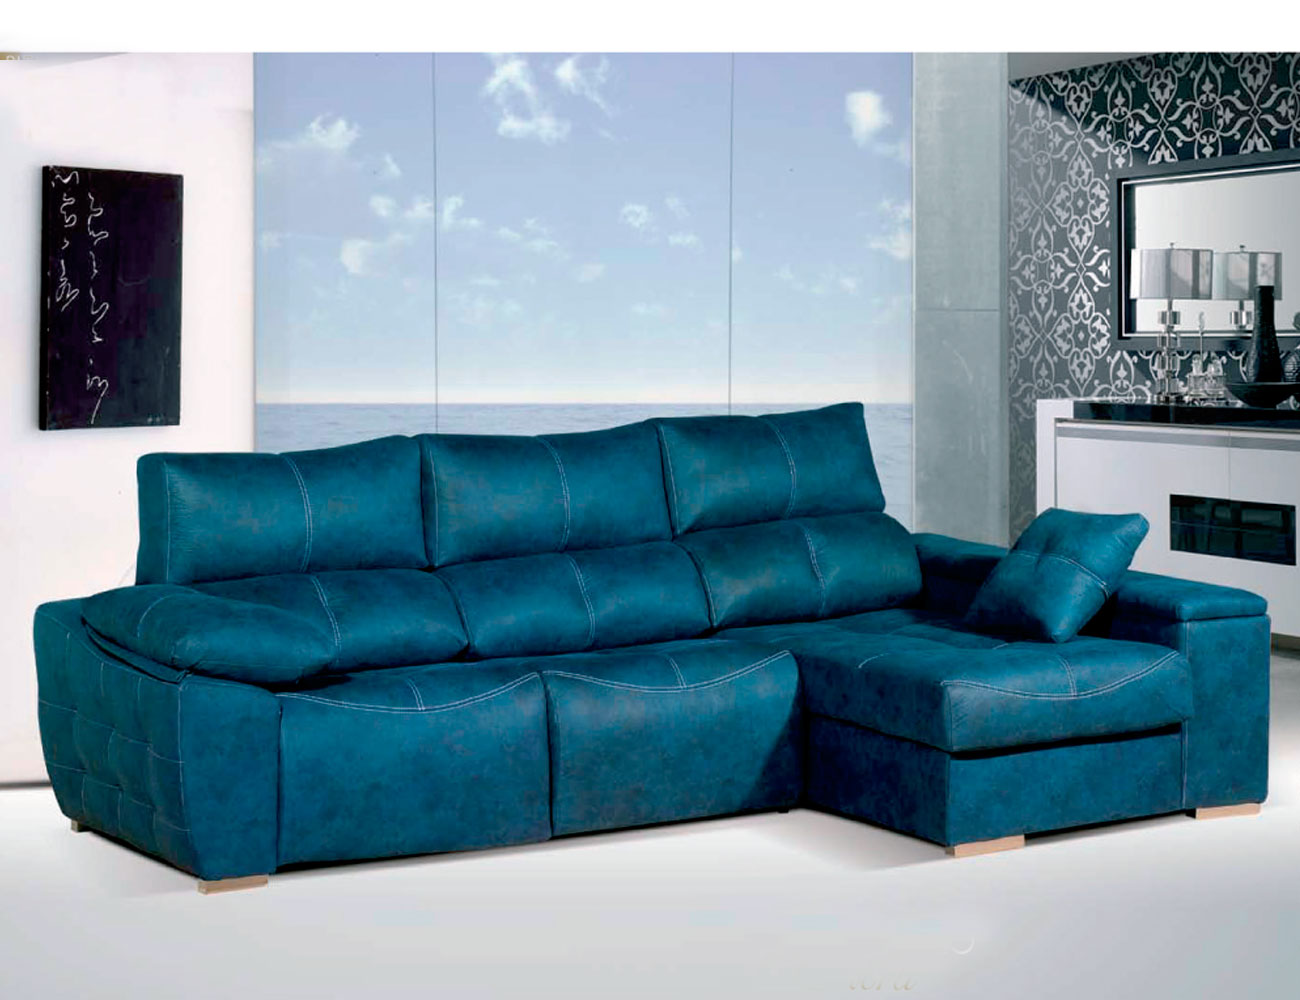 Sofa chaiselongue relax 2 motores anti manchas turquesa24